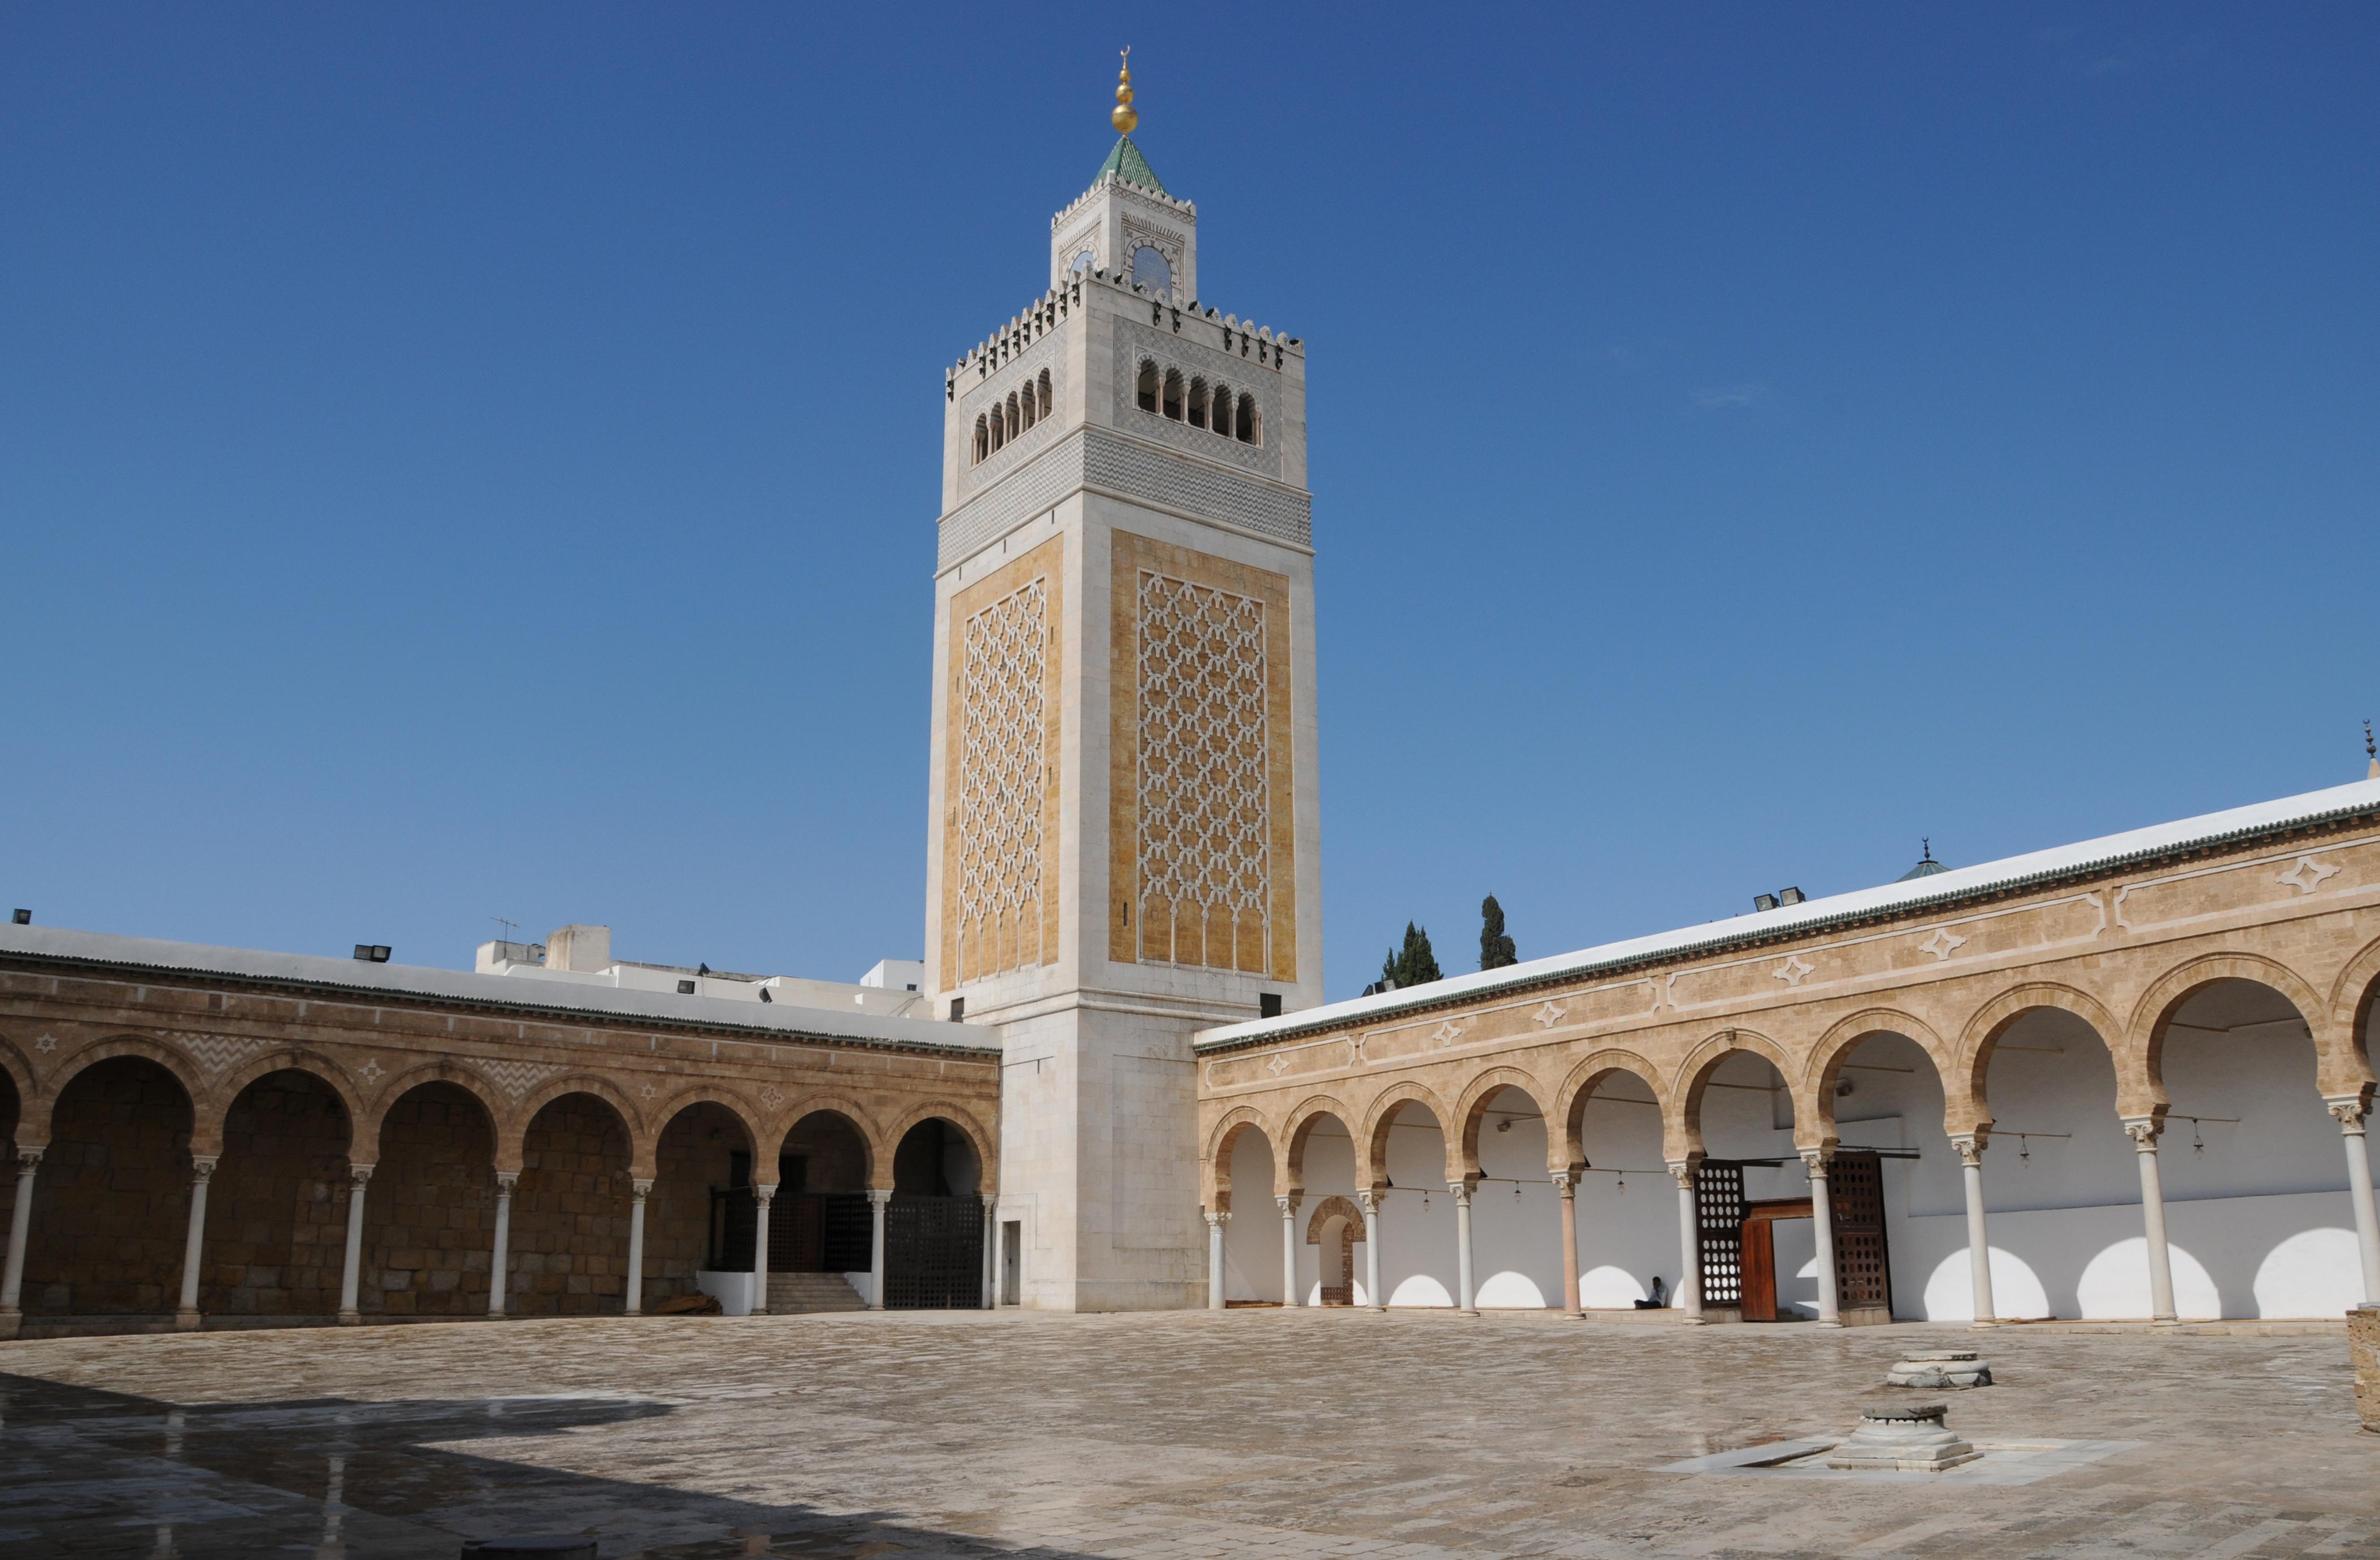 Al Zaytuna Mosque Wikipedia